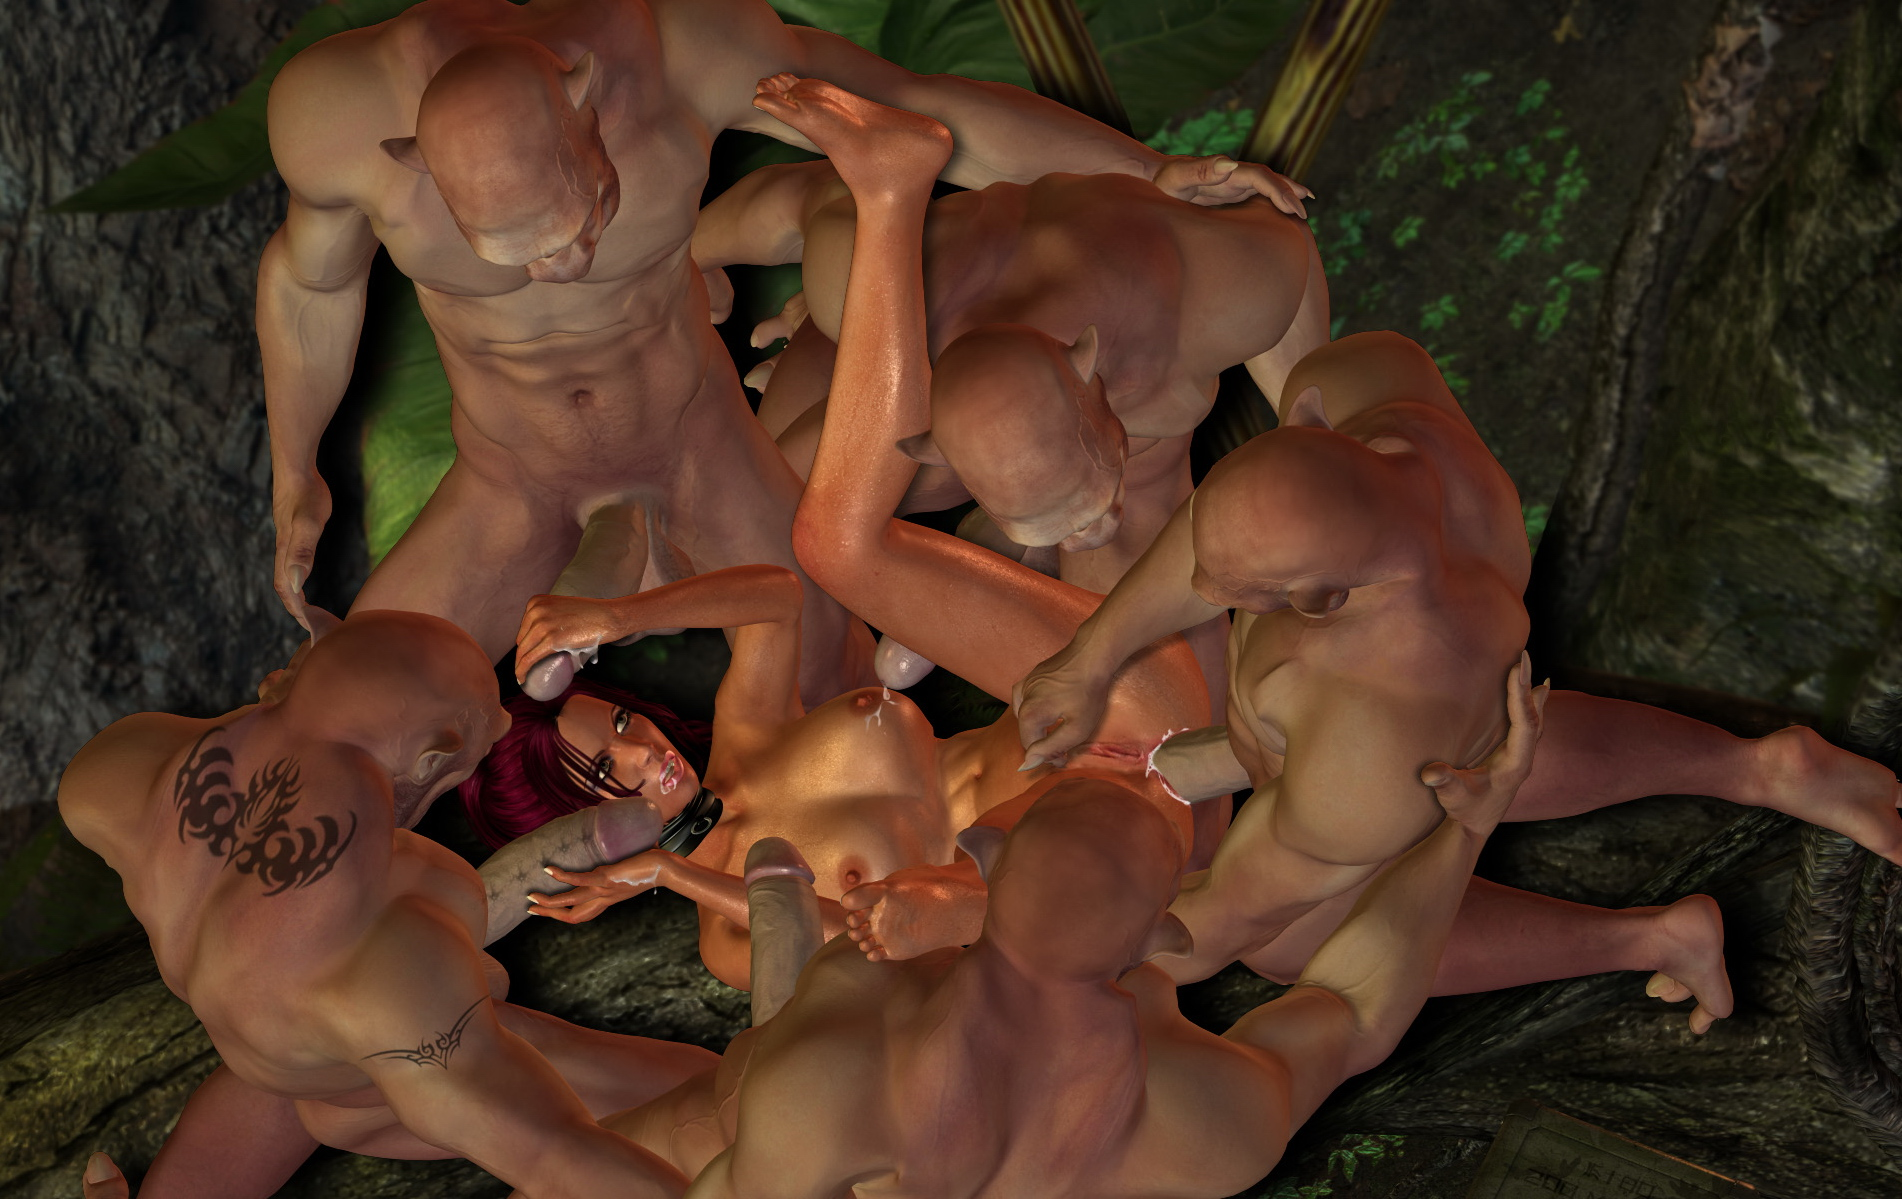 3 d порно секс видео